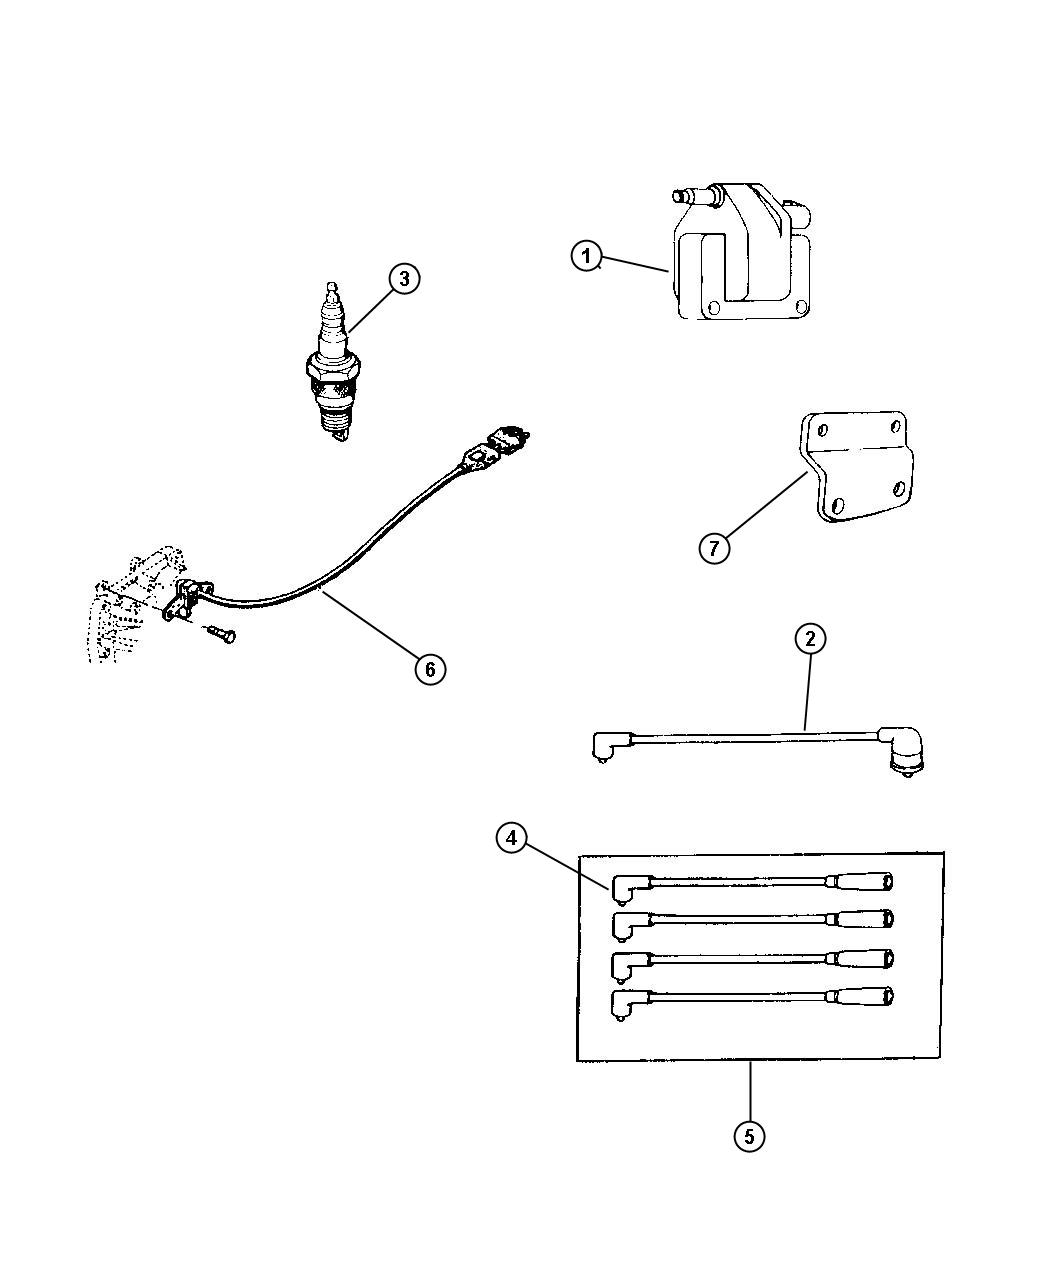 Jeep Wrangler Spark plug. Rc-12-lyc5. 2.5l engine, 4.0l